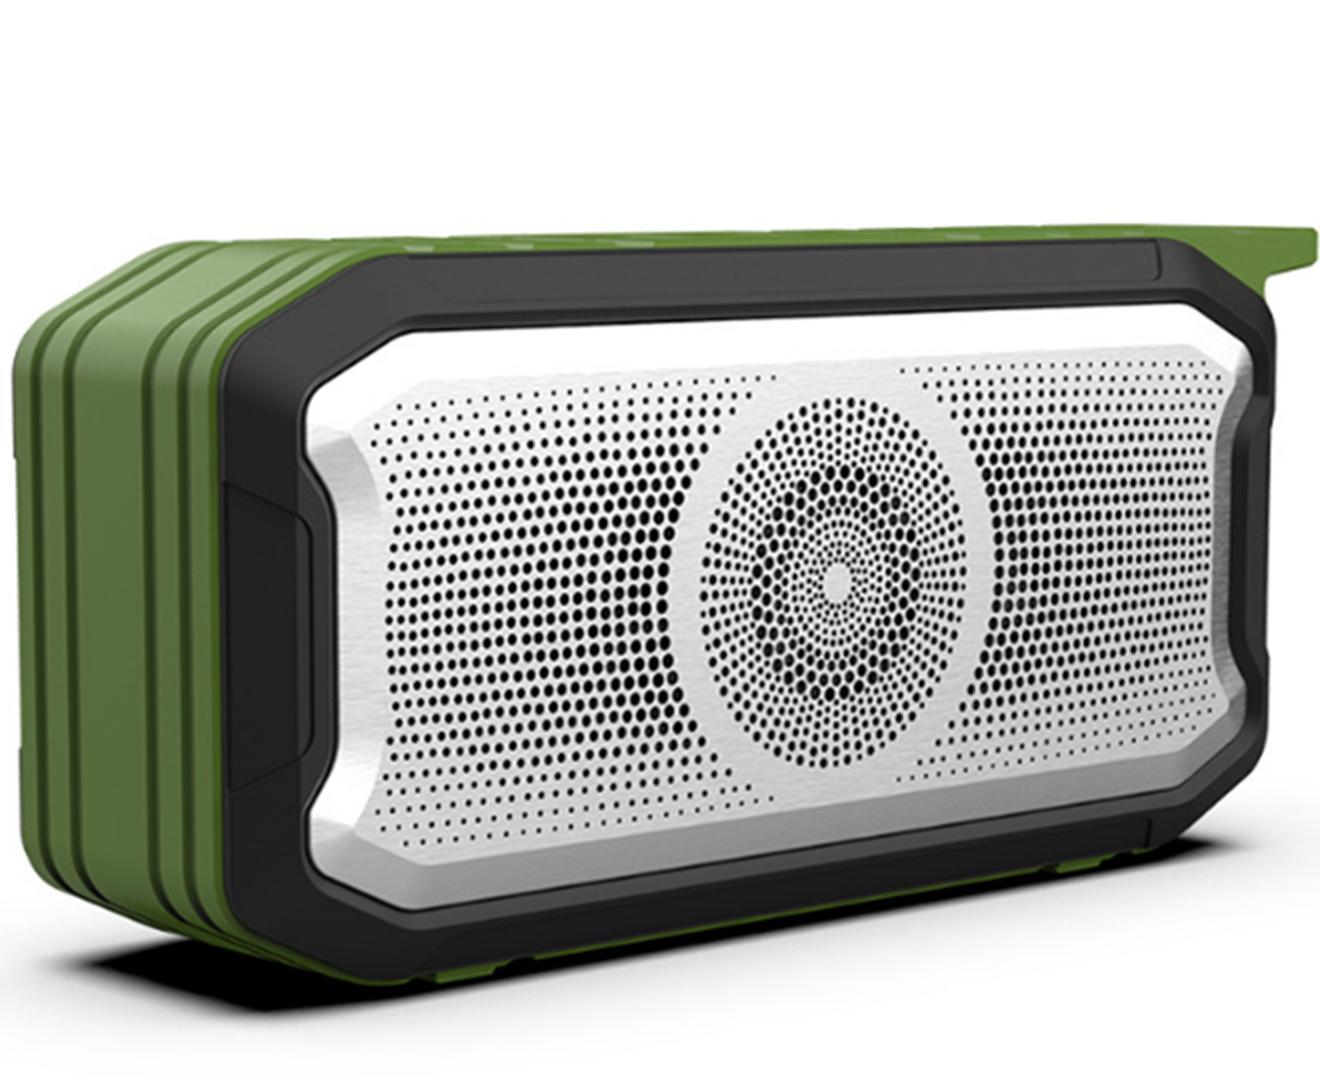 Creative Portable Wireless Bluetooth Speaker 5.0 IPX7 Waterproof Subwoofer Card Outdoor Audio-Green